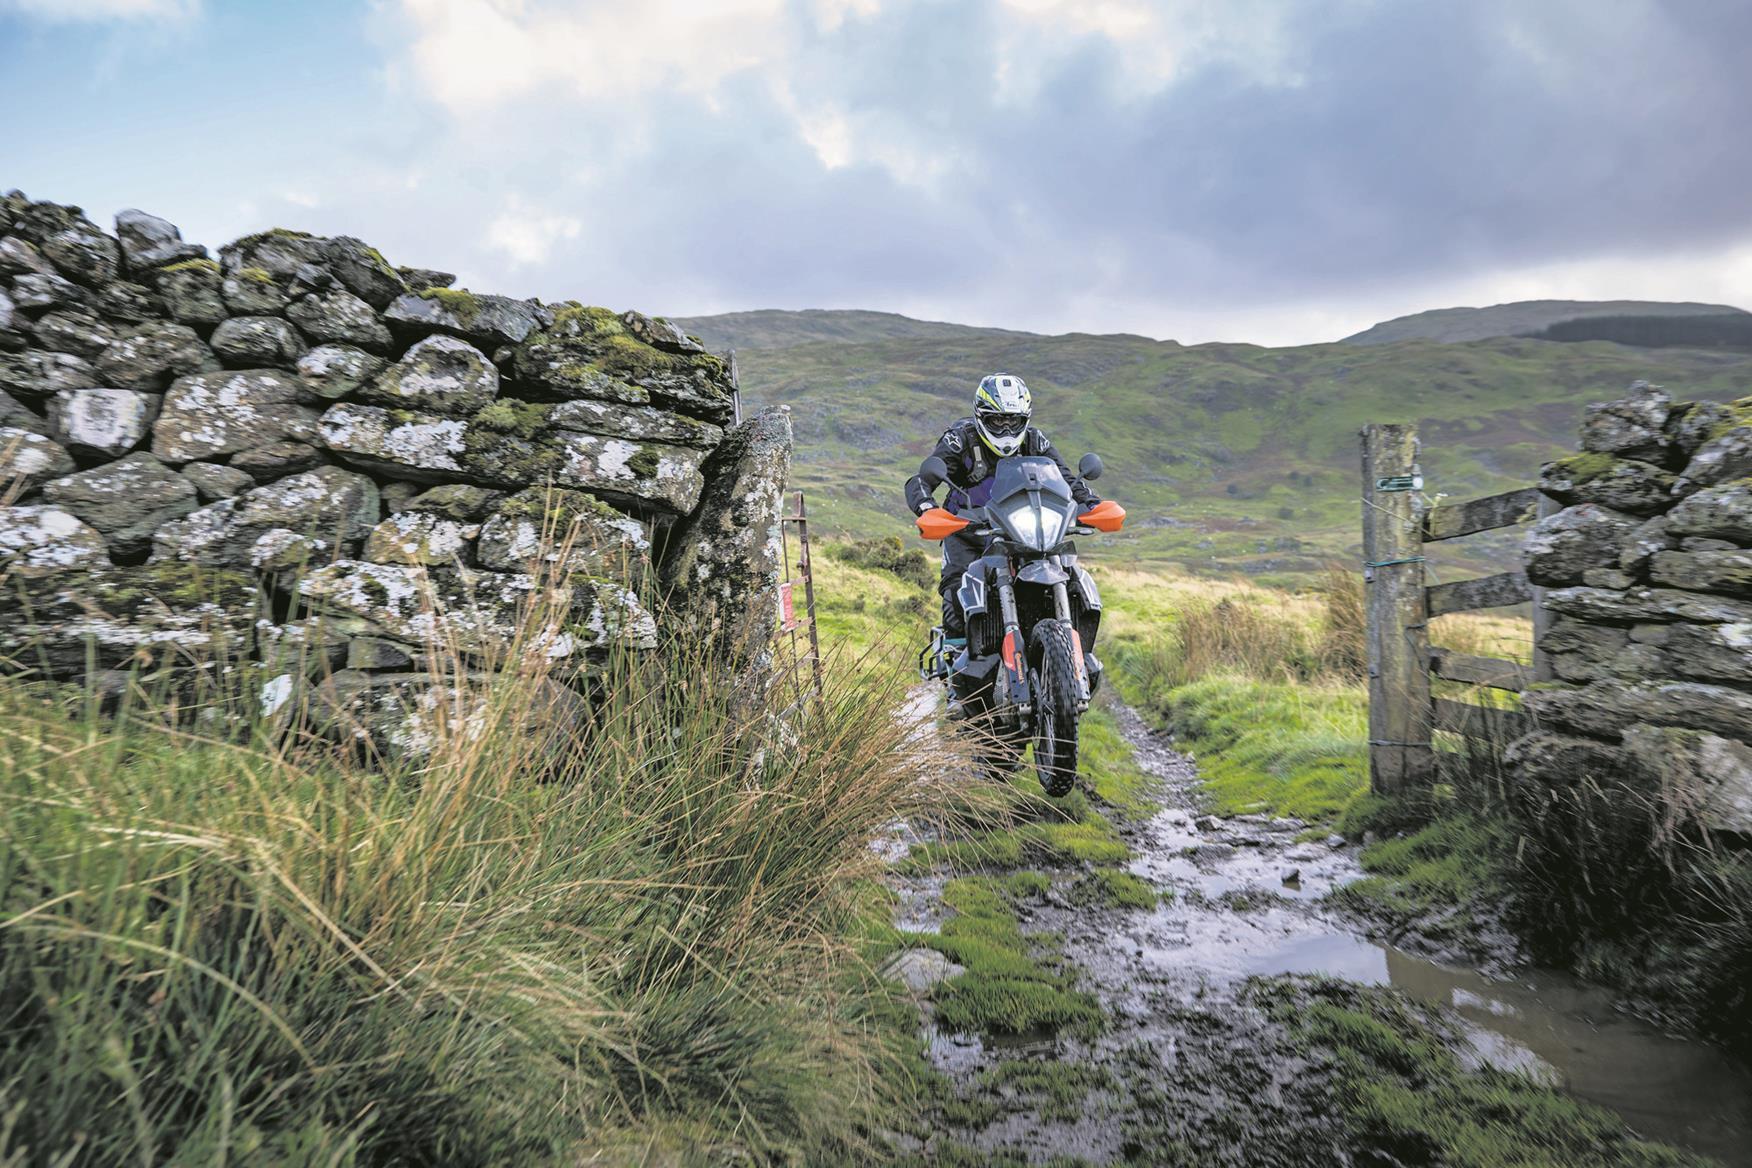 Exploring some British off-road trails